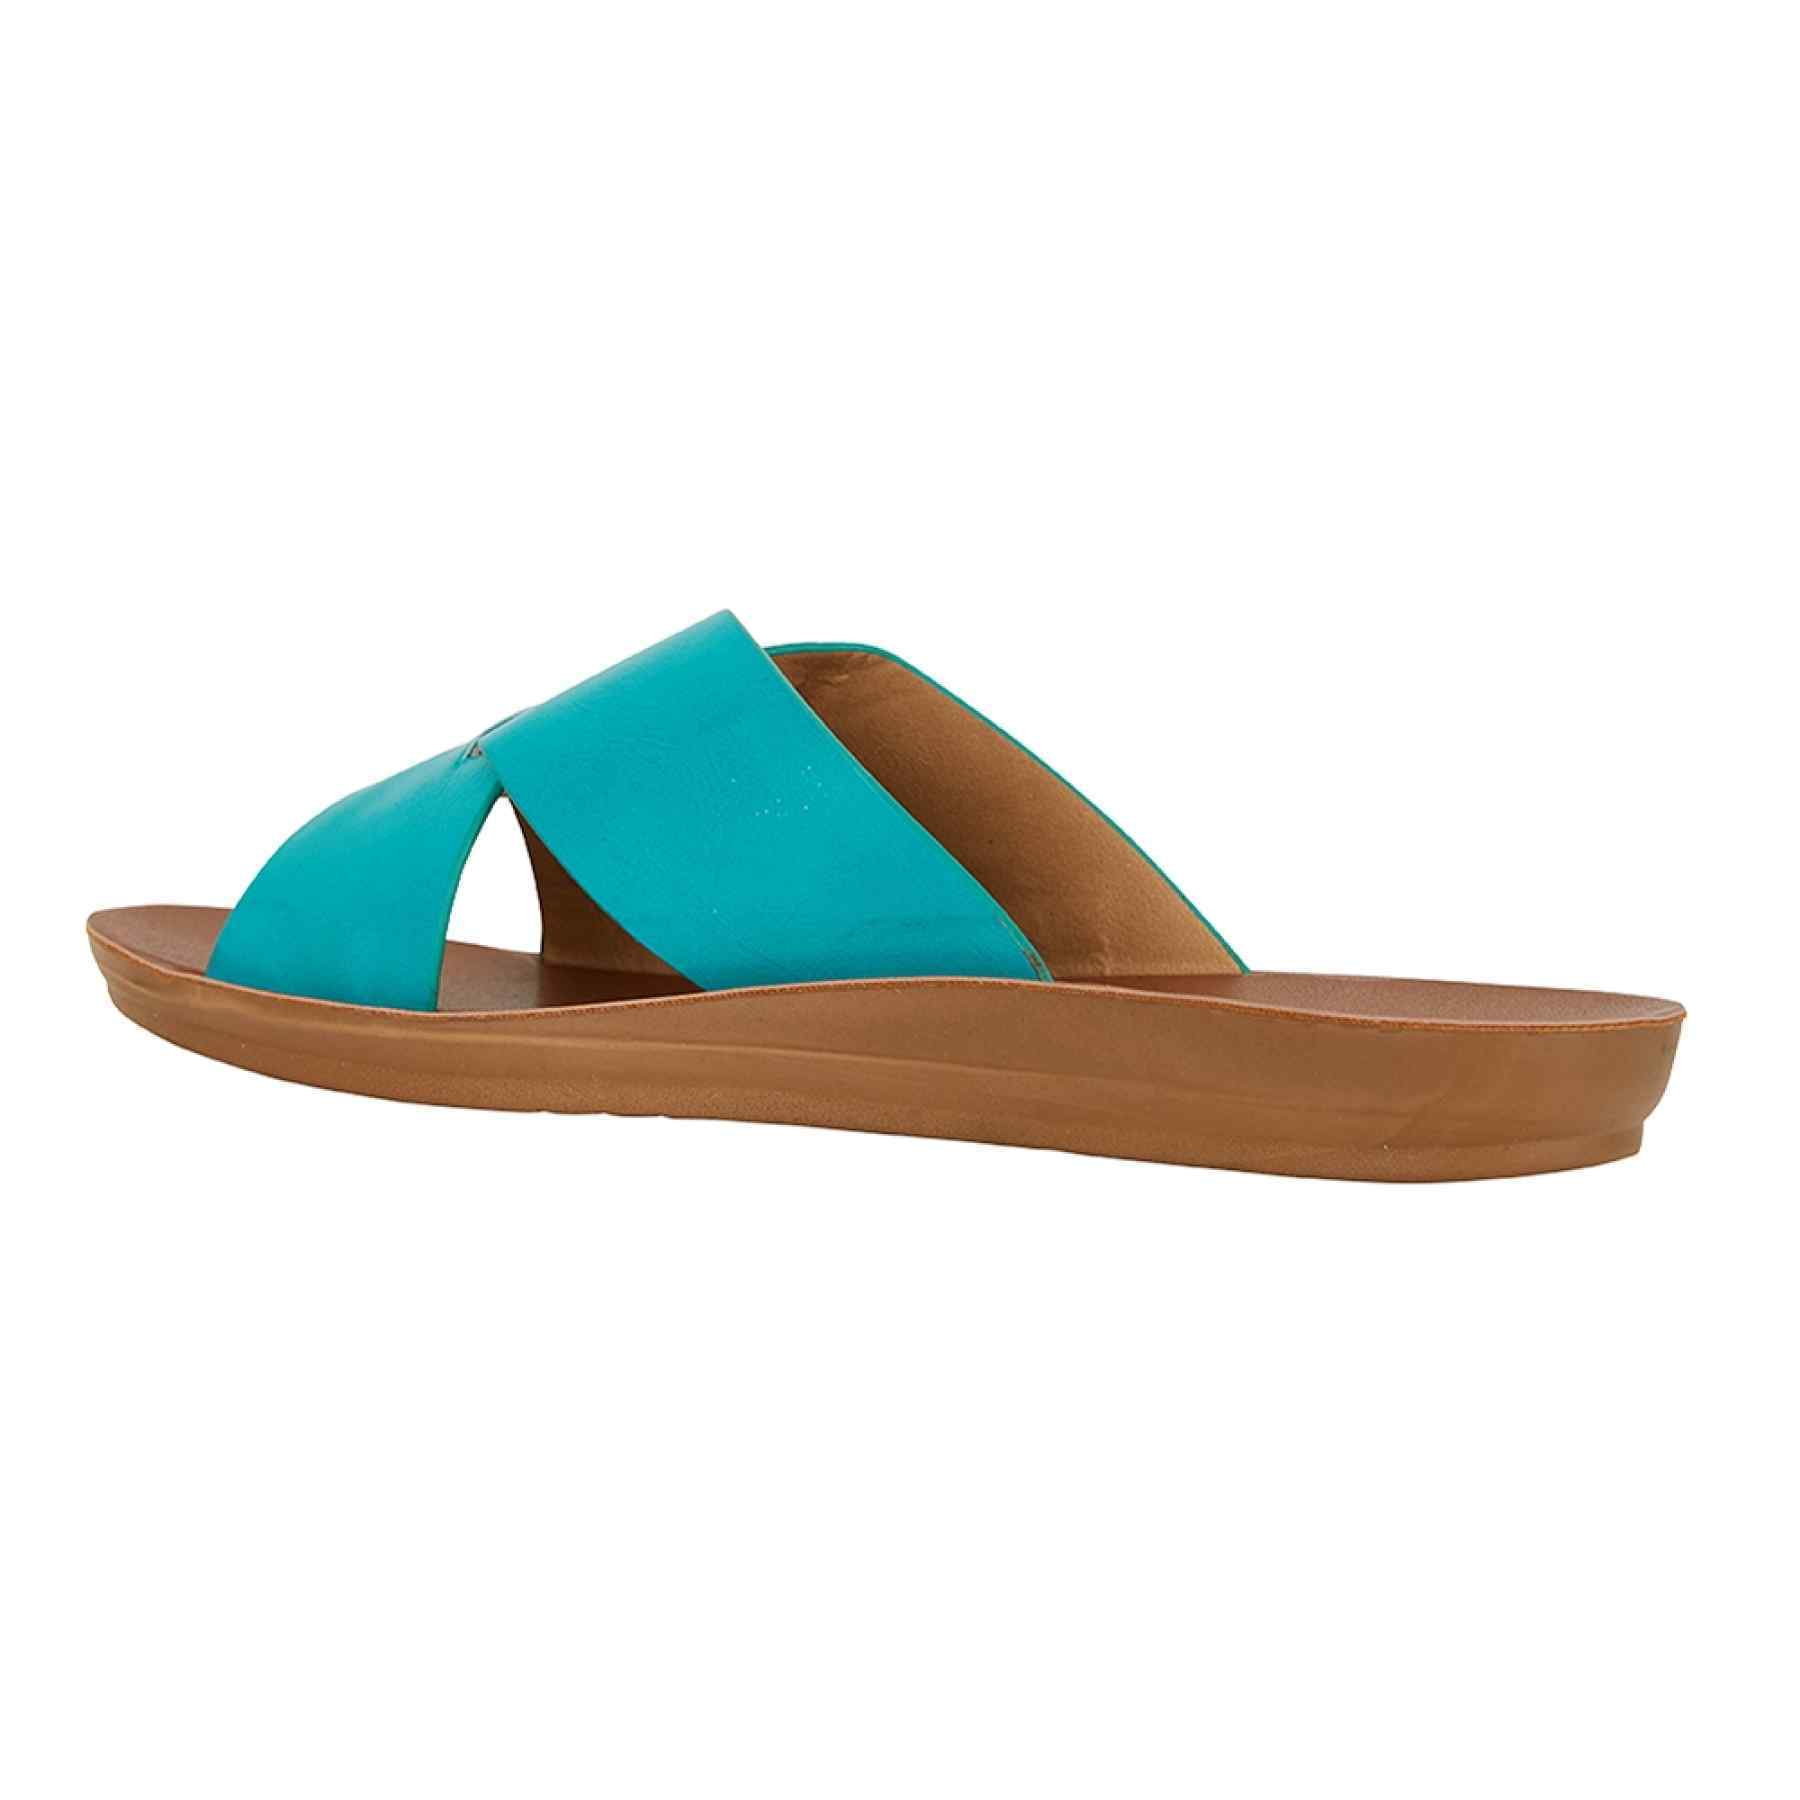 Gizmo - Turquoise